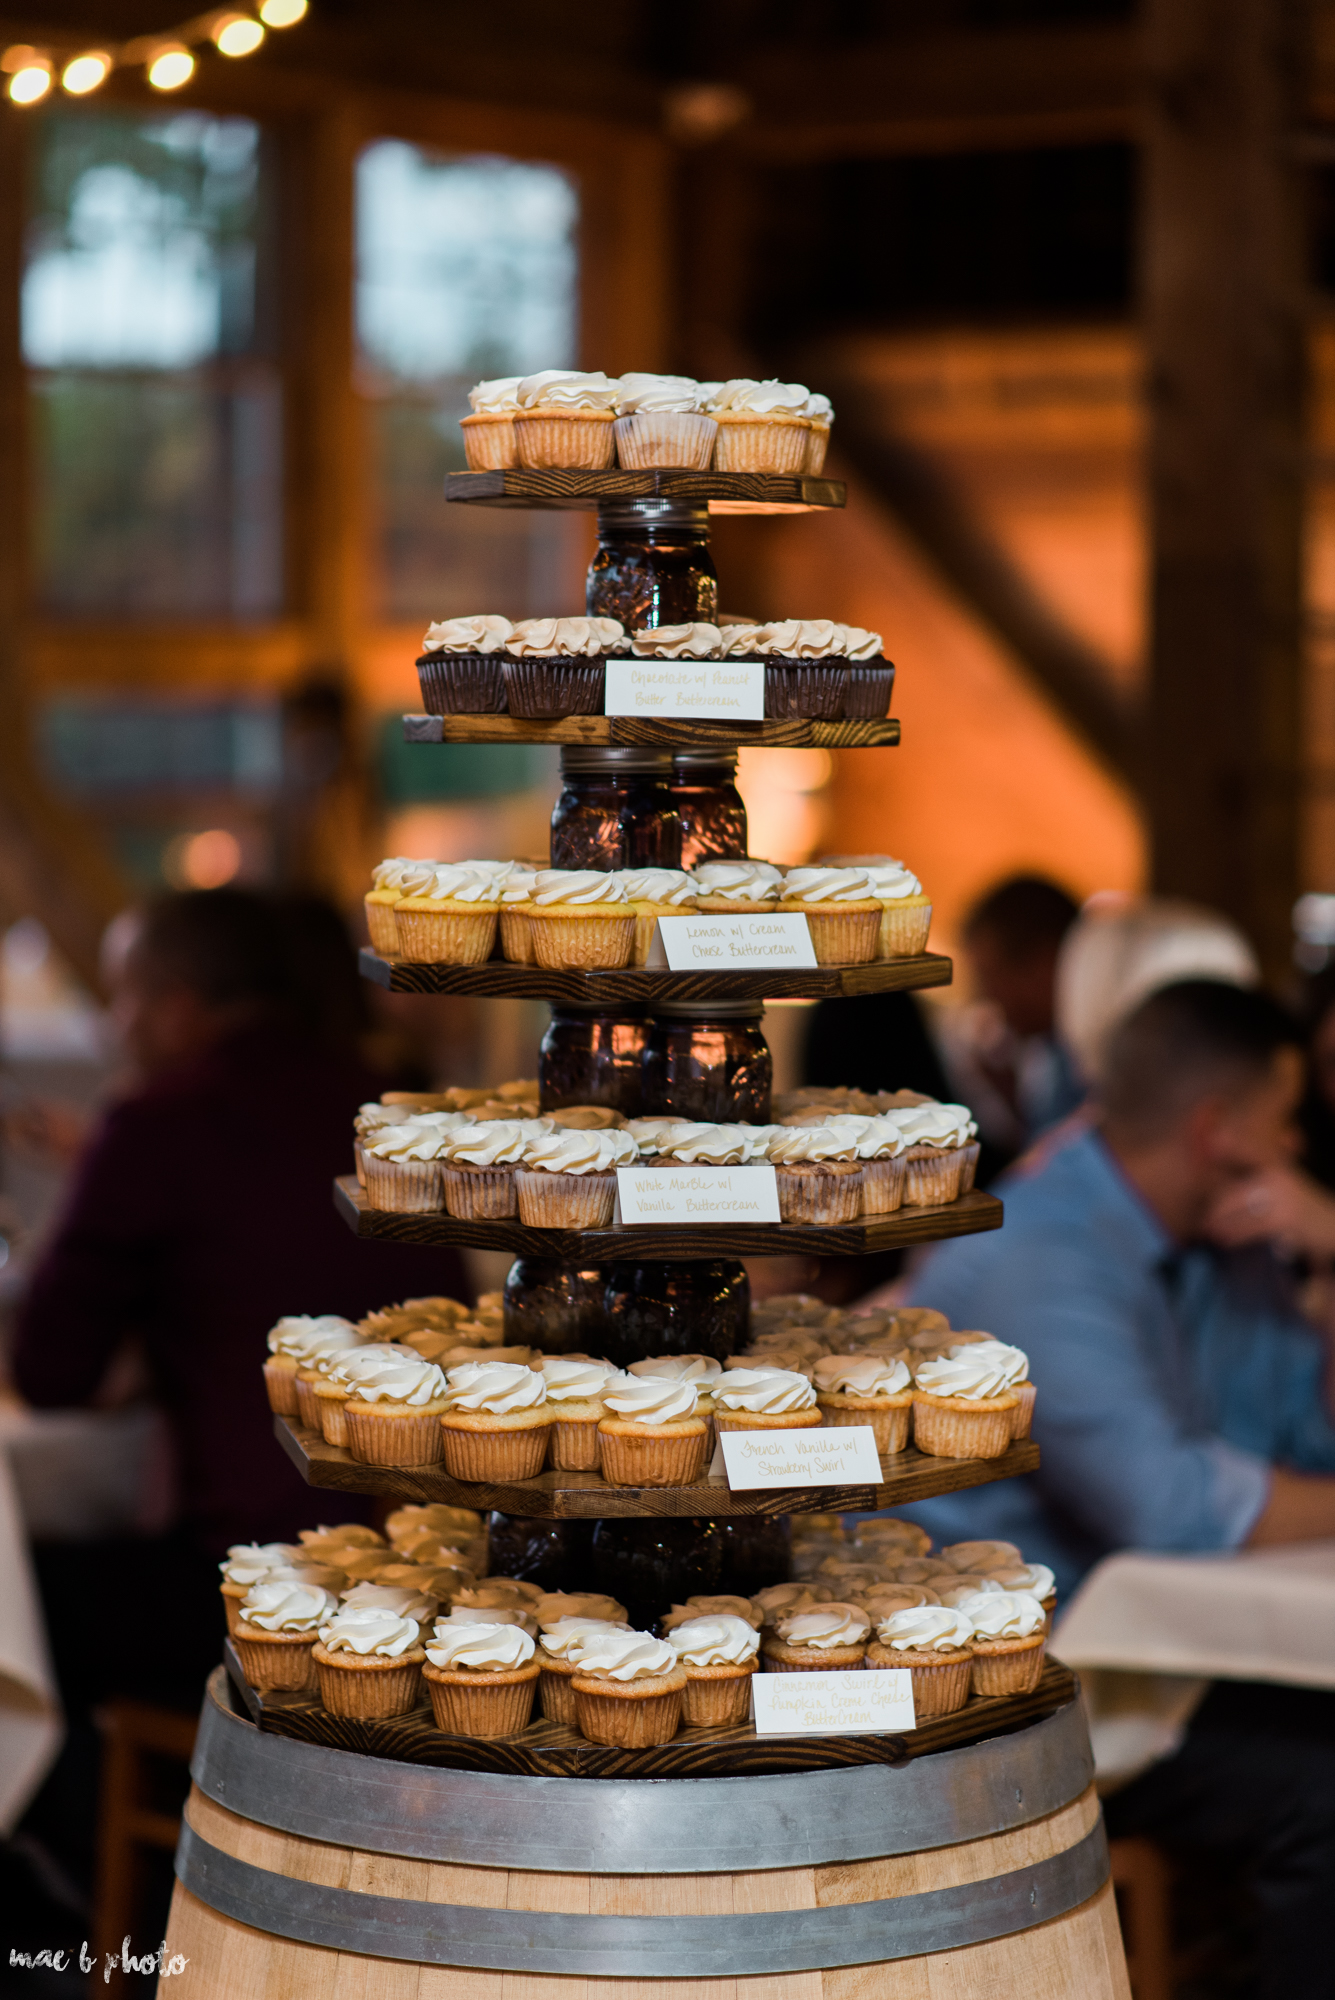 Sarah & Dustin's Rustic Chic Barn Wedding at Hartford Hill Winery in Hartford, Ohio by Mae B Photo-108.jpg